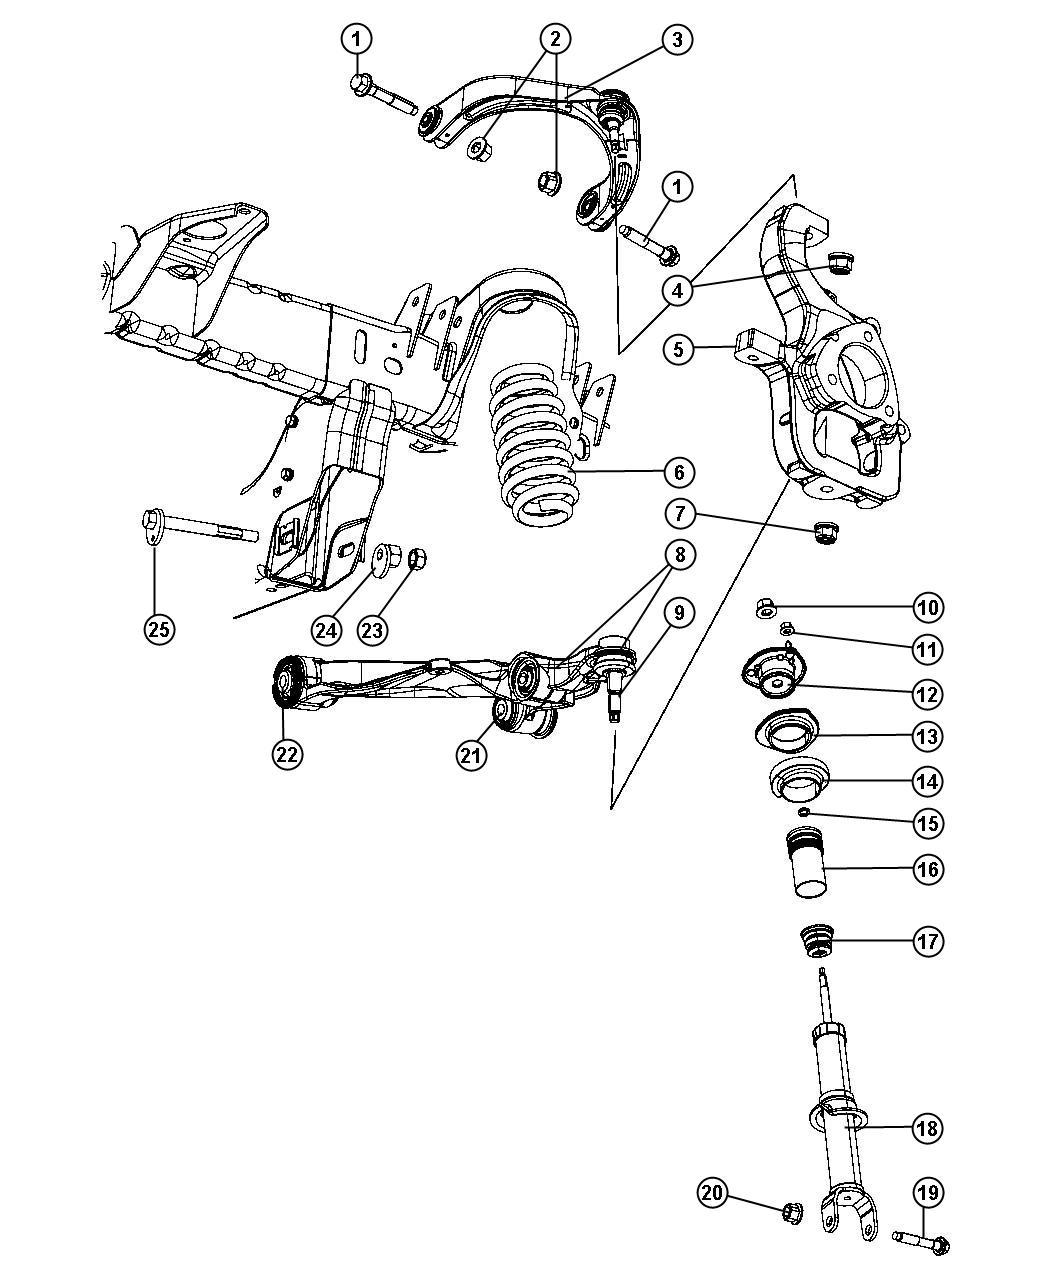 Dodge Dakota Nut Hex Flange Lock M14x2 00 Mounting Lca